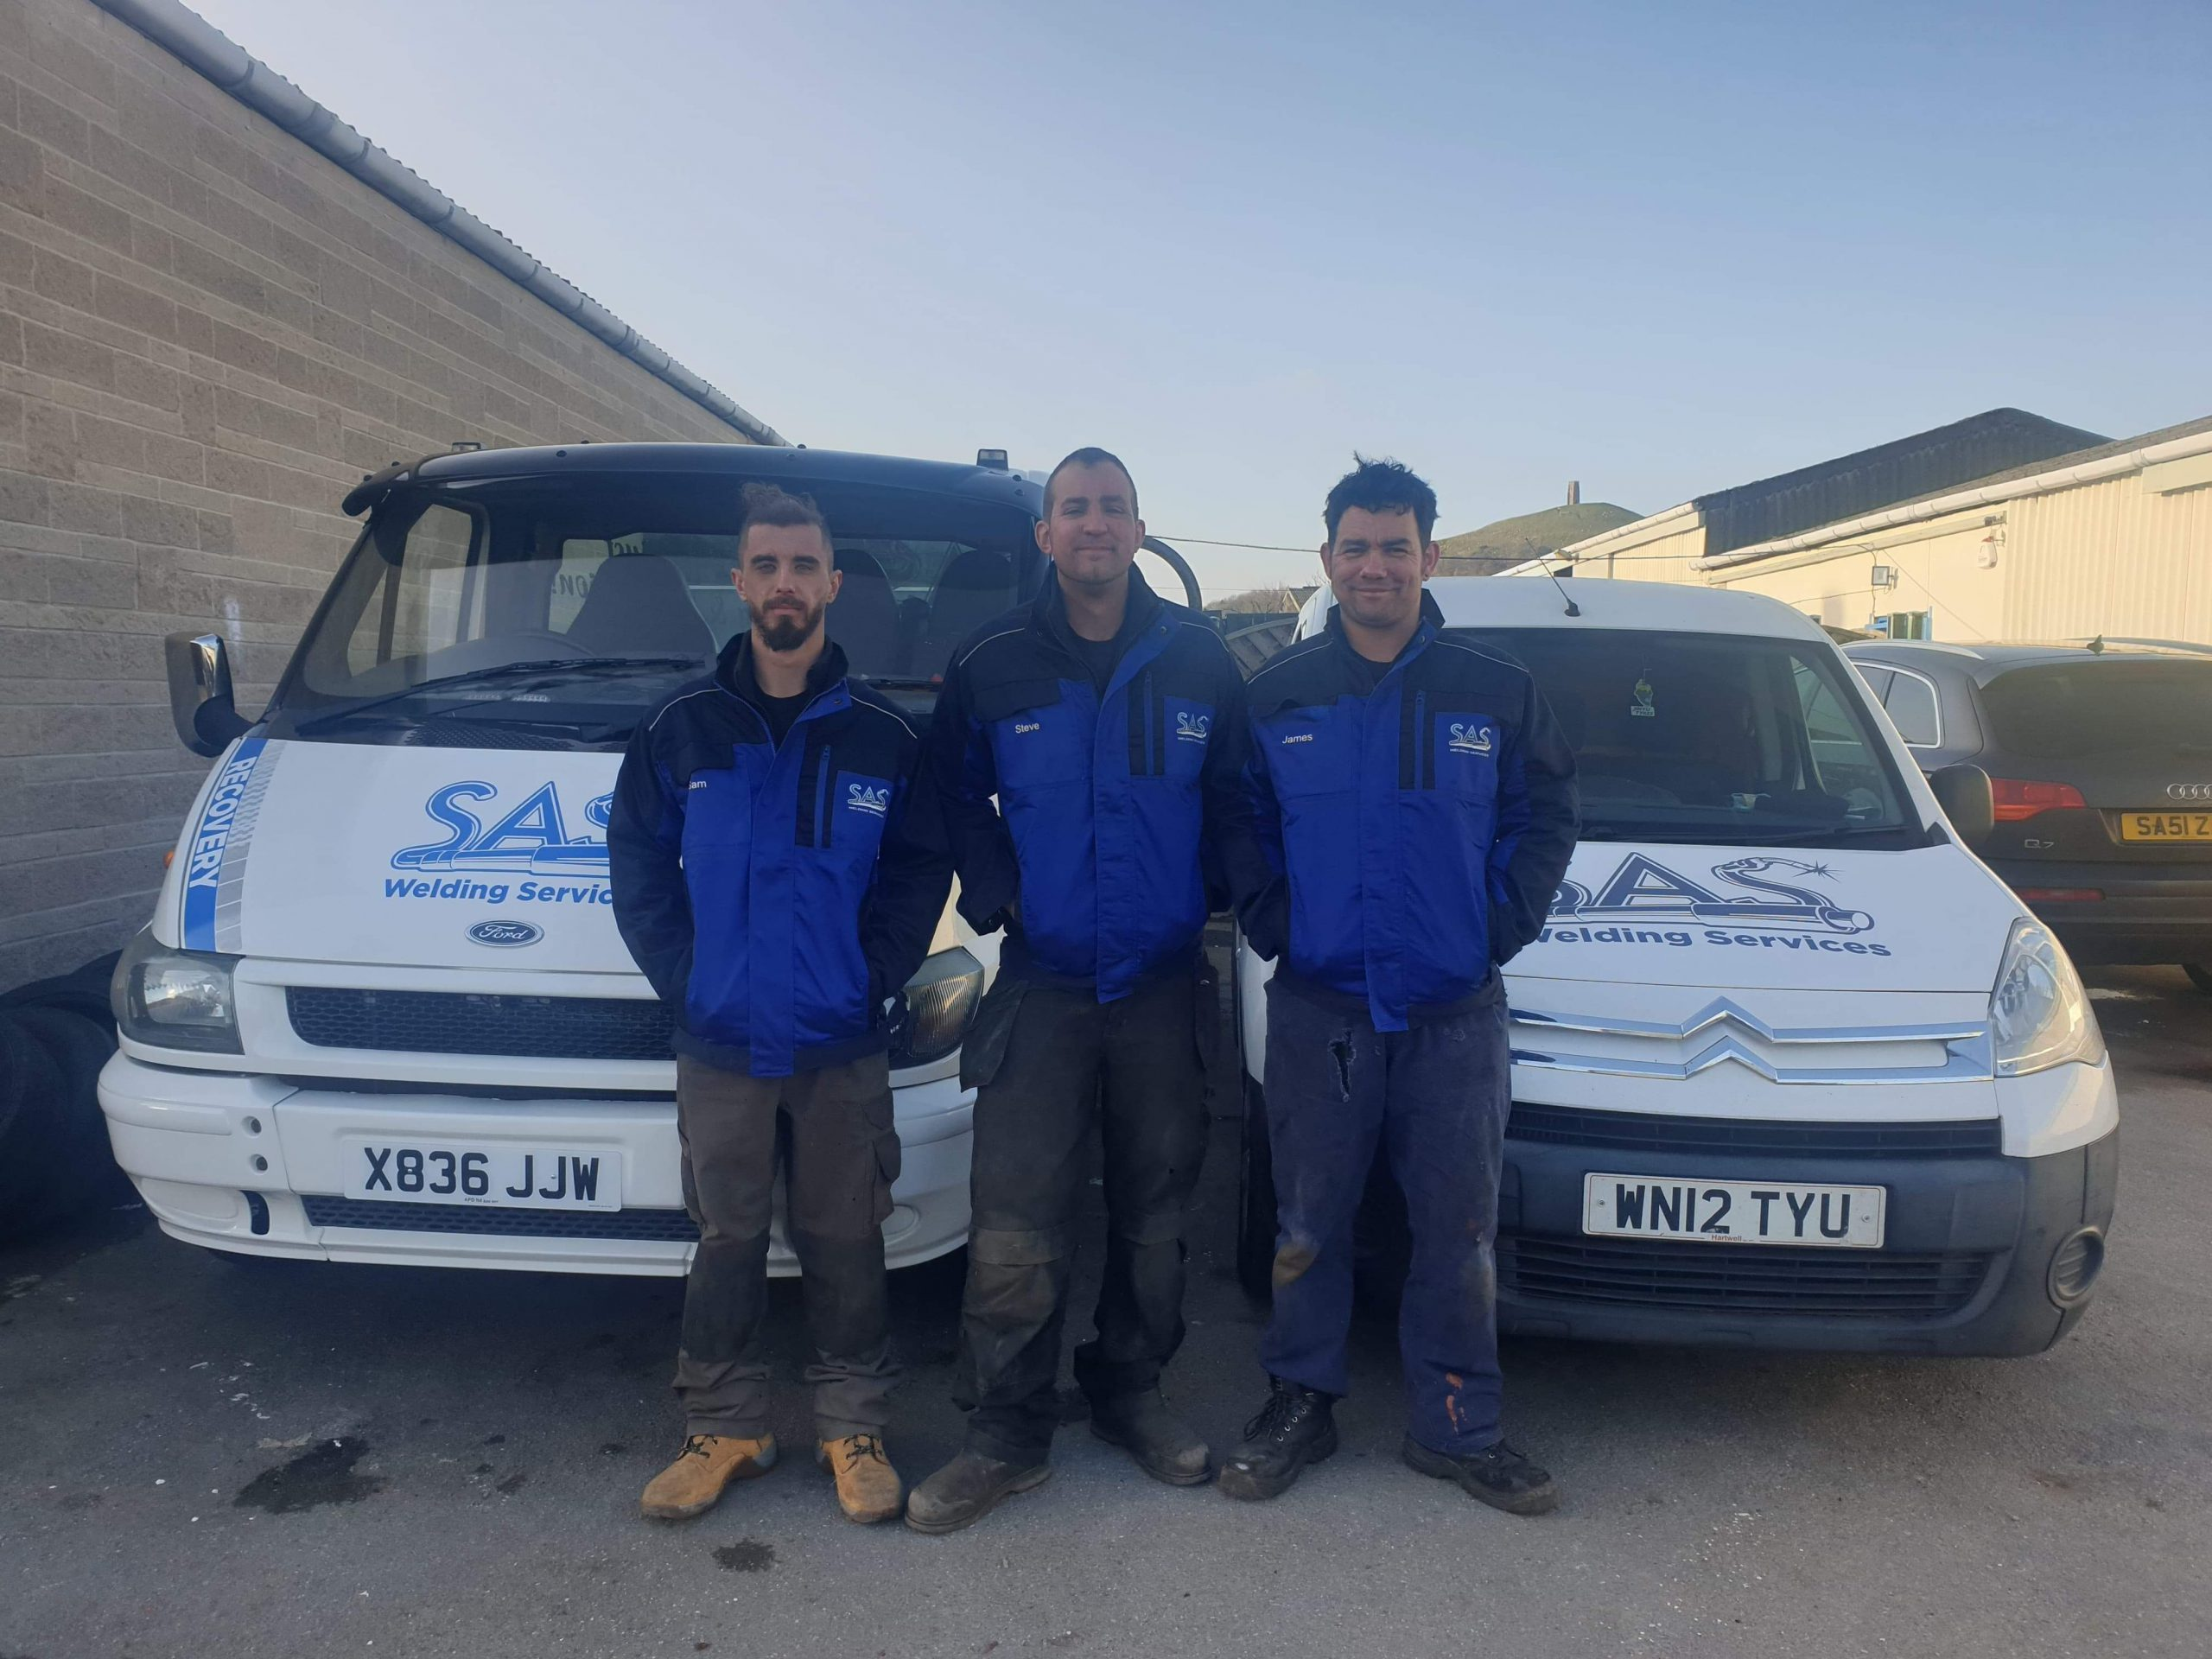 SAS Mobile Tyre Service